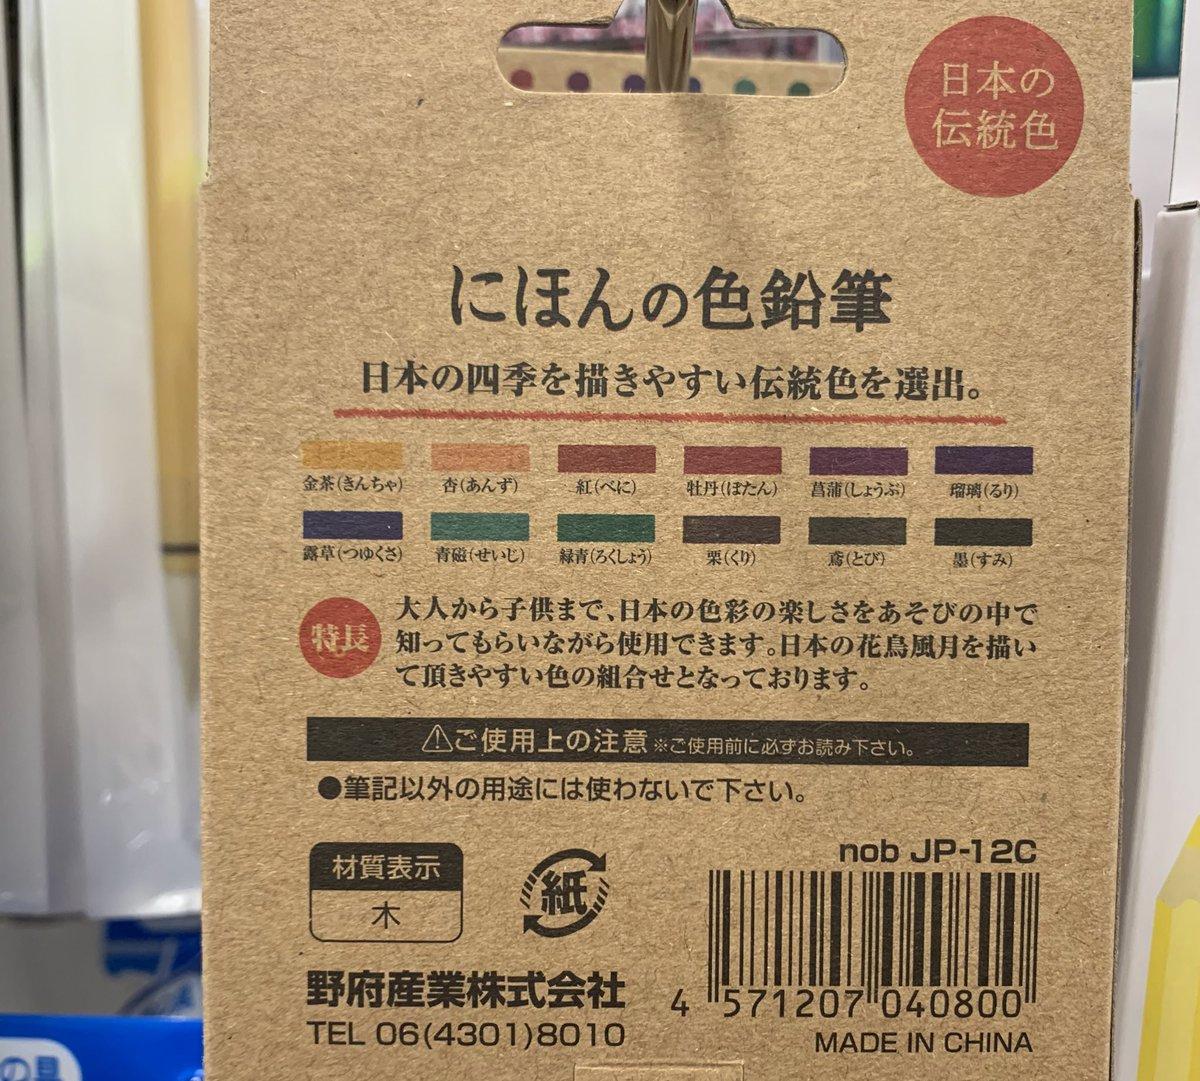 test ツイッターメディア - セリアで気の利いた色鉛筆を見つけた…! 日本の伝統色な色鉛筆 色の名前もかわいみ// #セリア https://t.co/0XtZS5uAZh